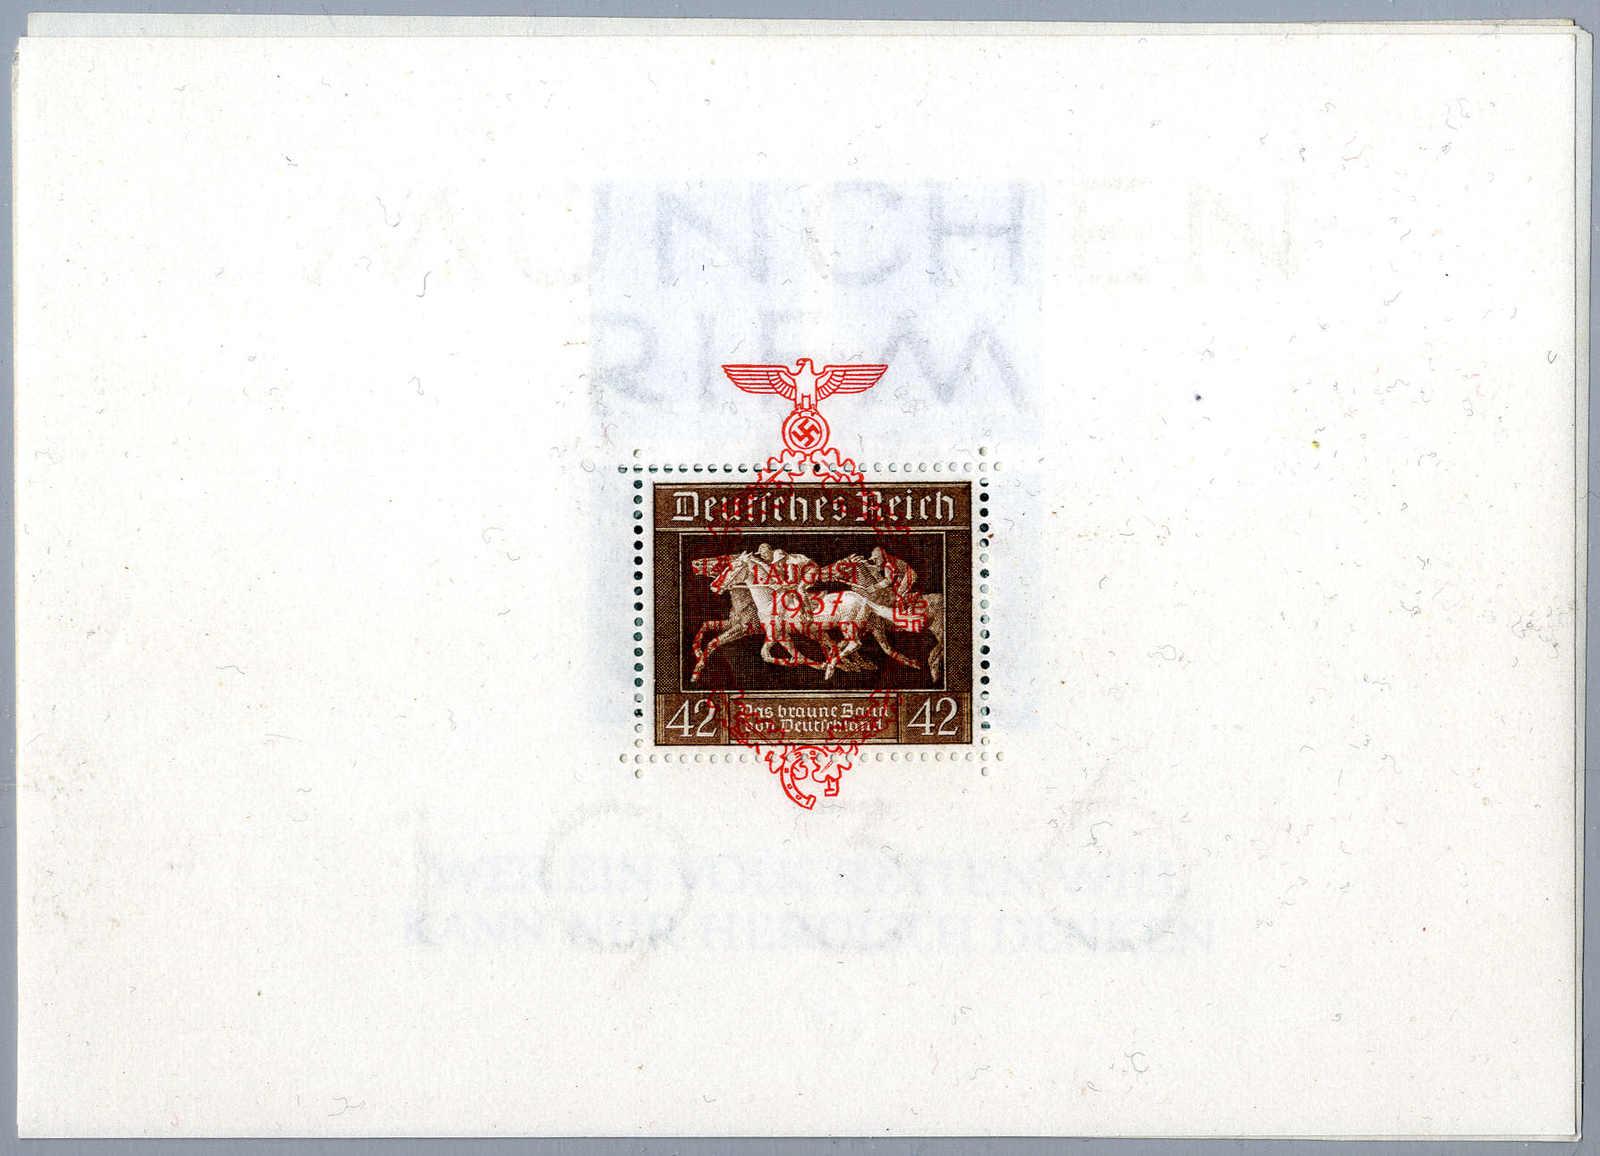 Lot 2895 - germany German Empire -  Viennafil Auktionen 63rd LIVE AUCTION